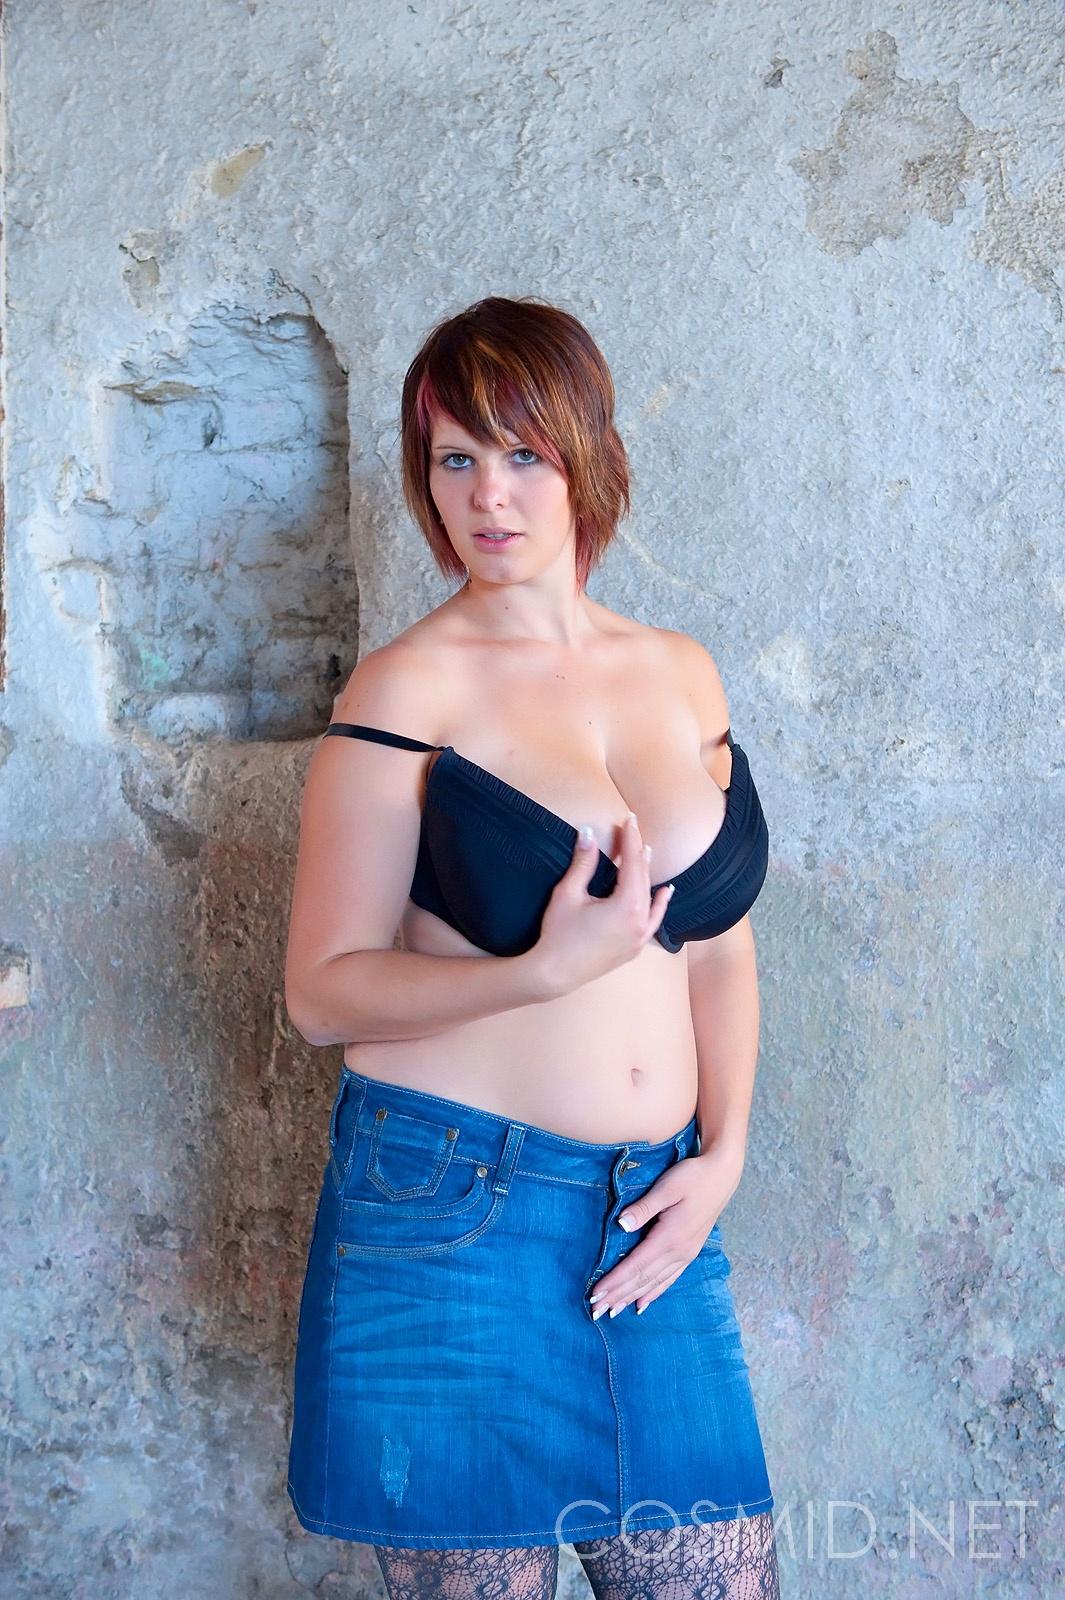 Jenny mcclain oils up her big 36f tits in sauna - 3 part 1